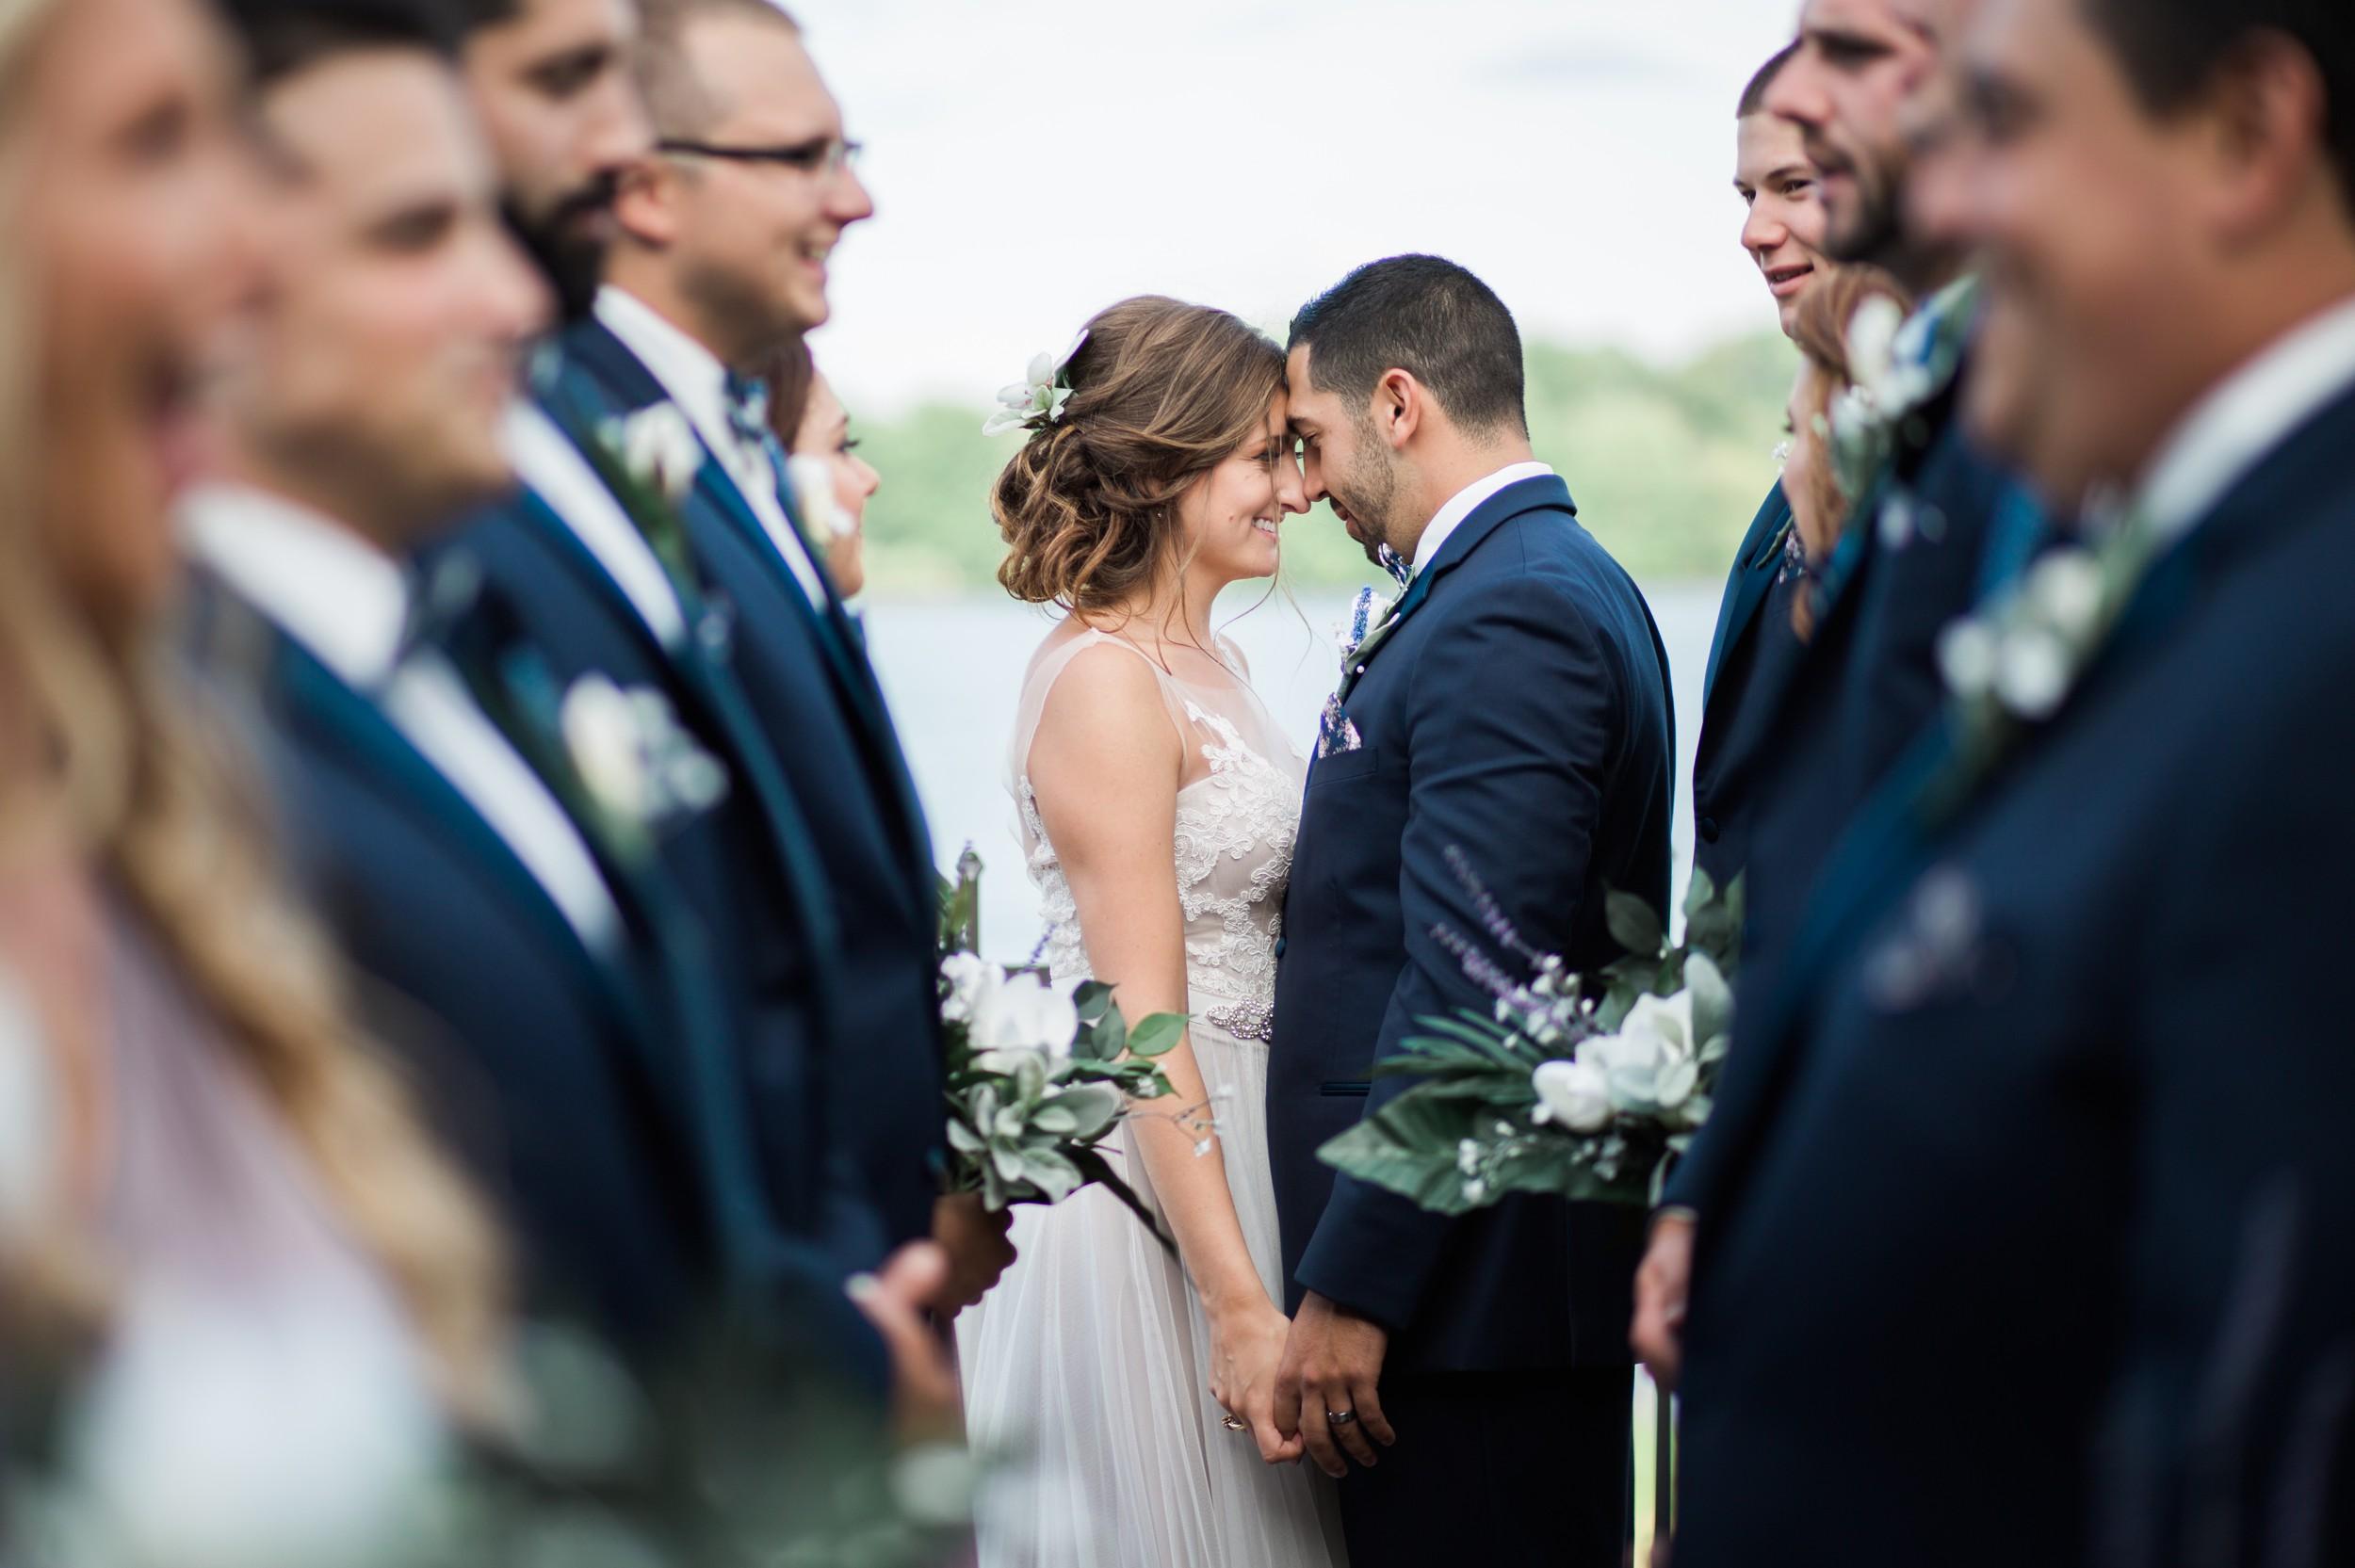 Nick-and-martina-pinelake-vinyards-wedding-columbiana-ohio-tracylynn-photography 20.jpg